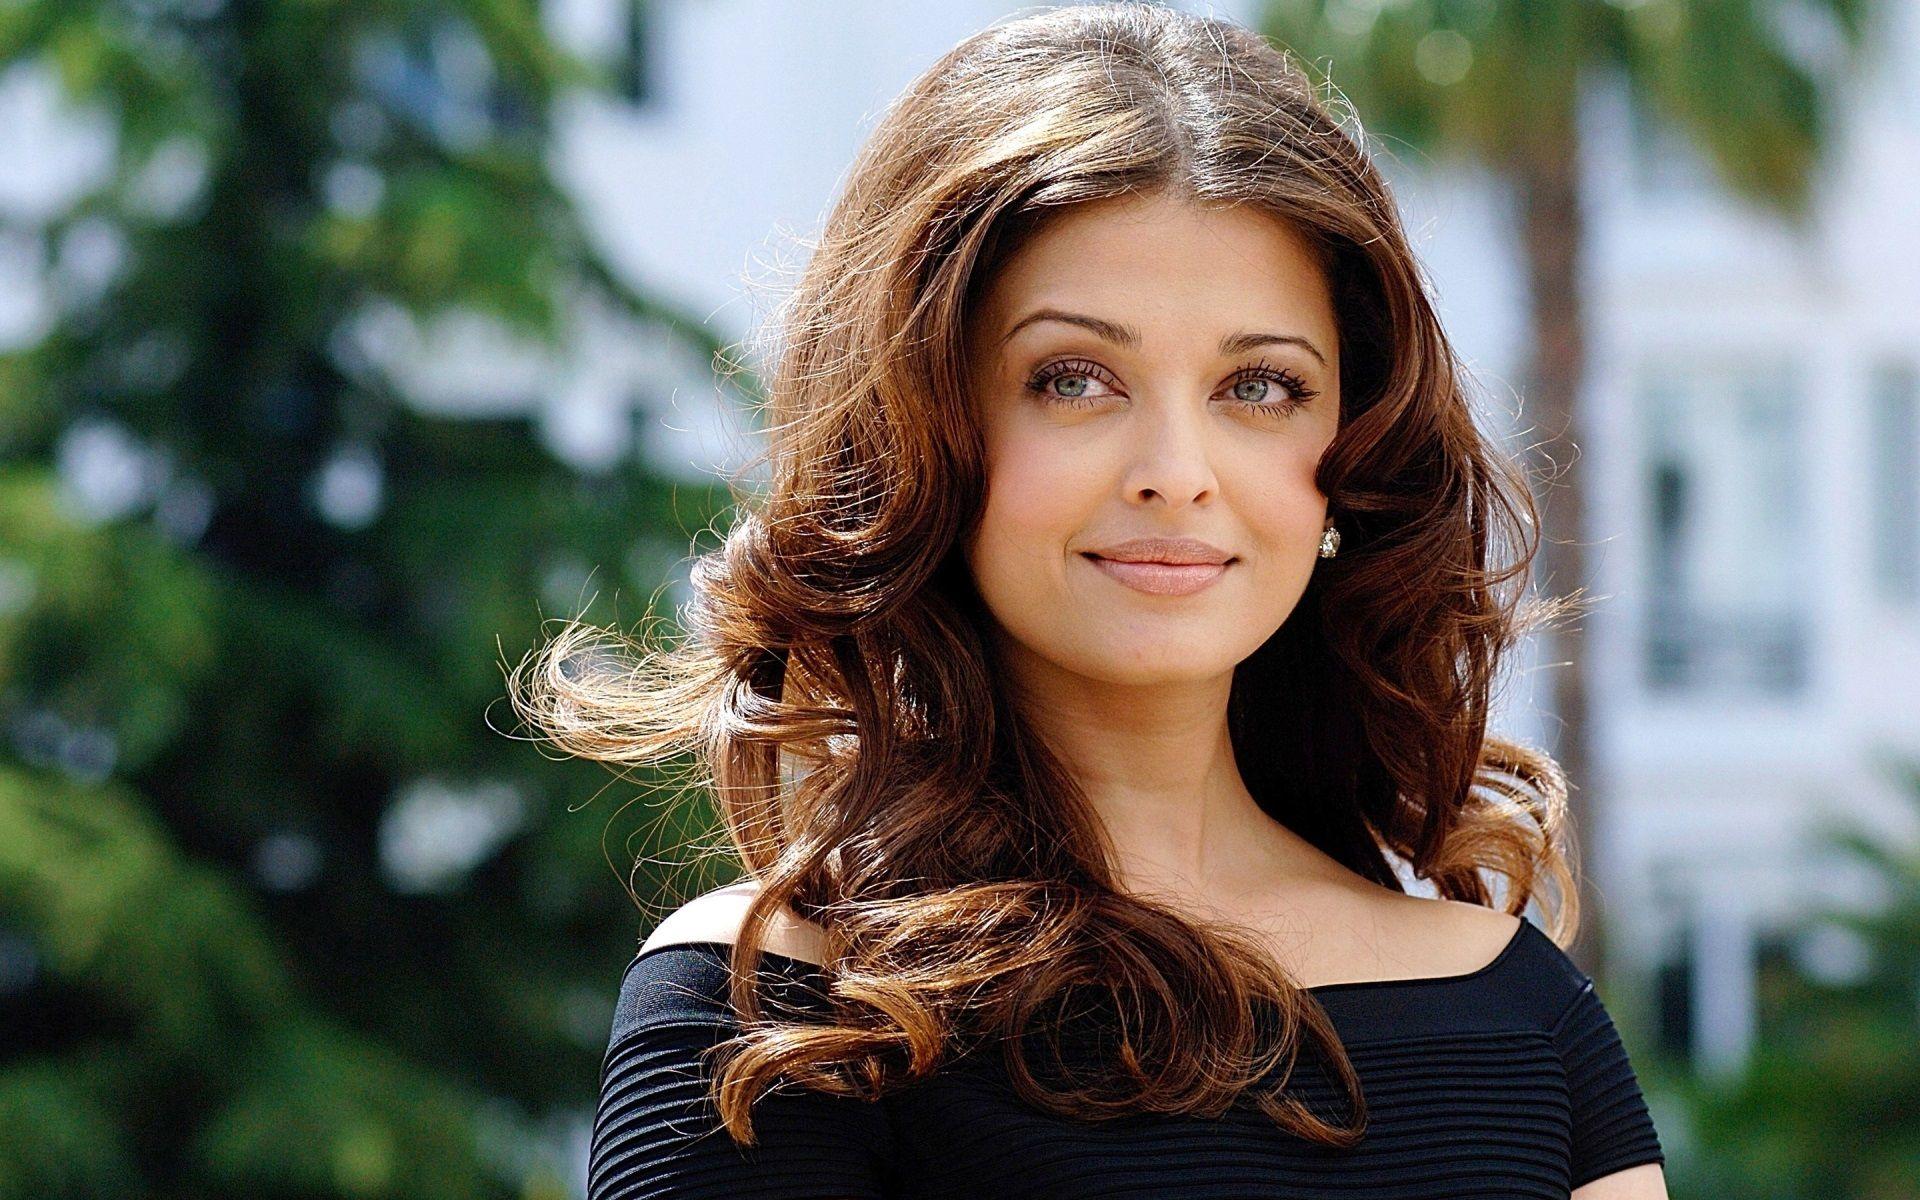 Top 25 Best Aishwarya Rai Wallpapers Hot And Hd Aishwarya Rai Hairstyle Aishwarya Rai Wallpaper Beauty